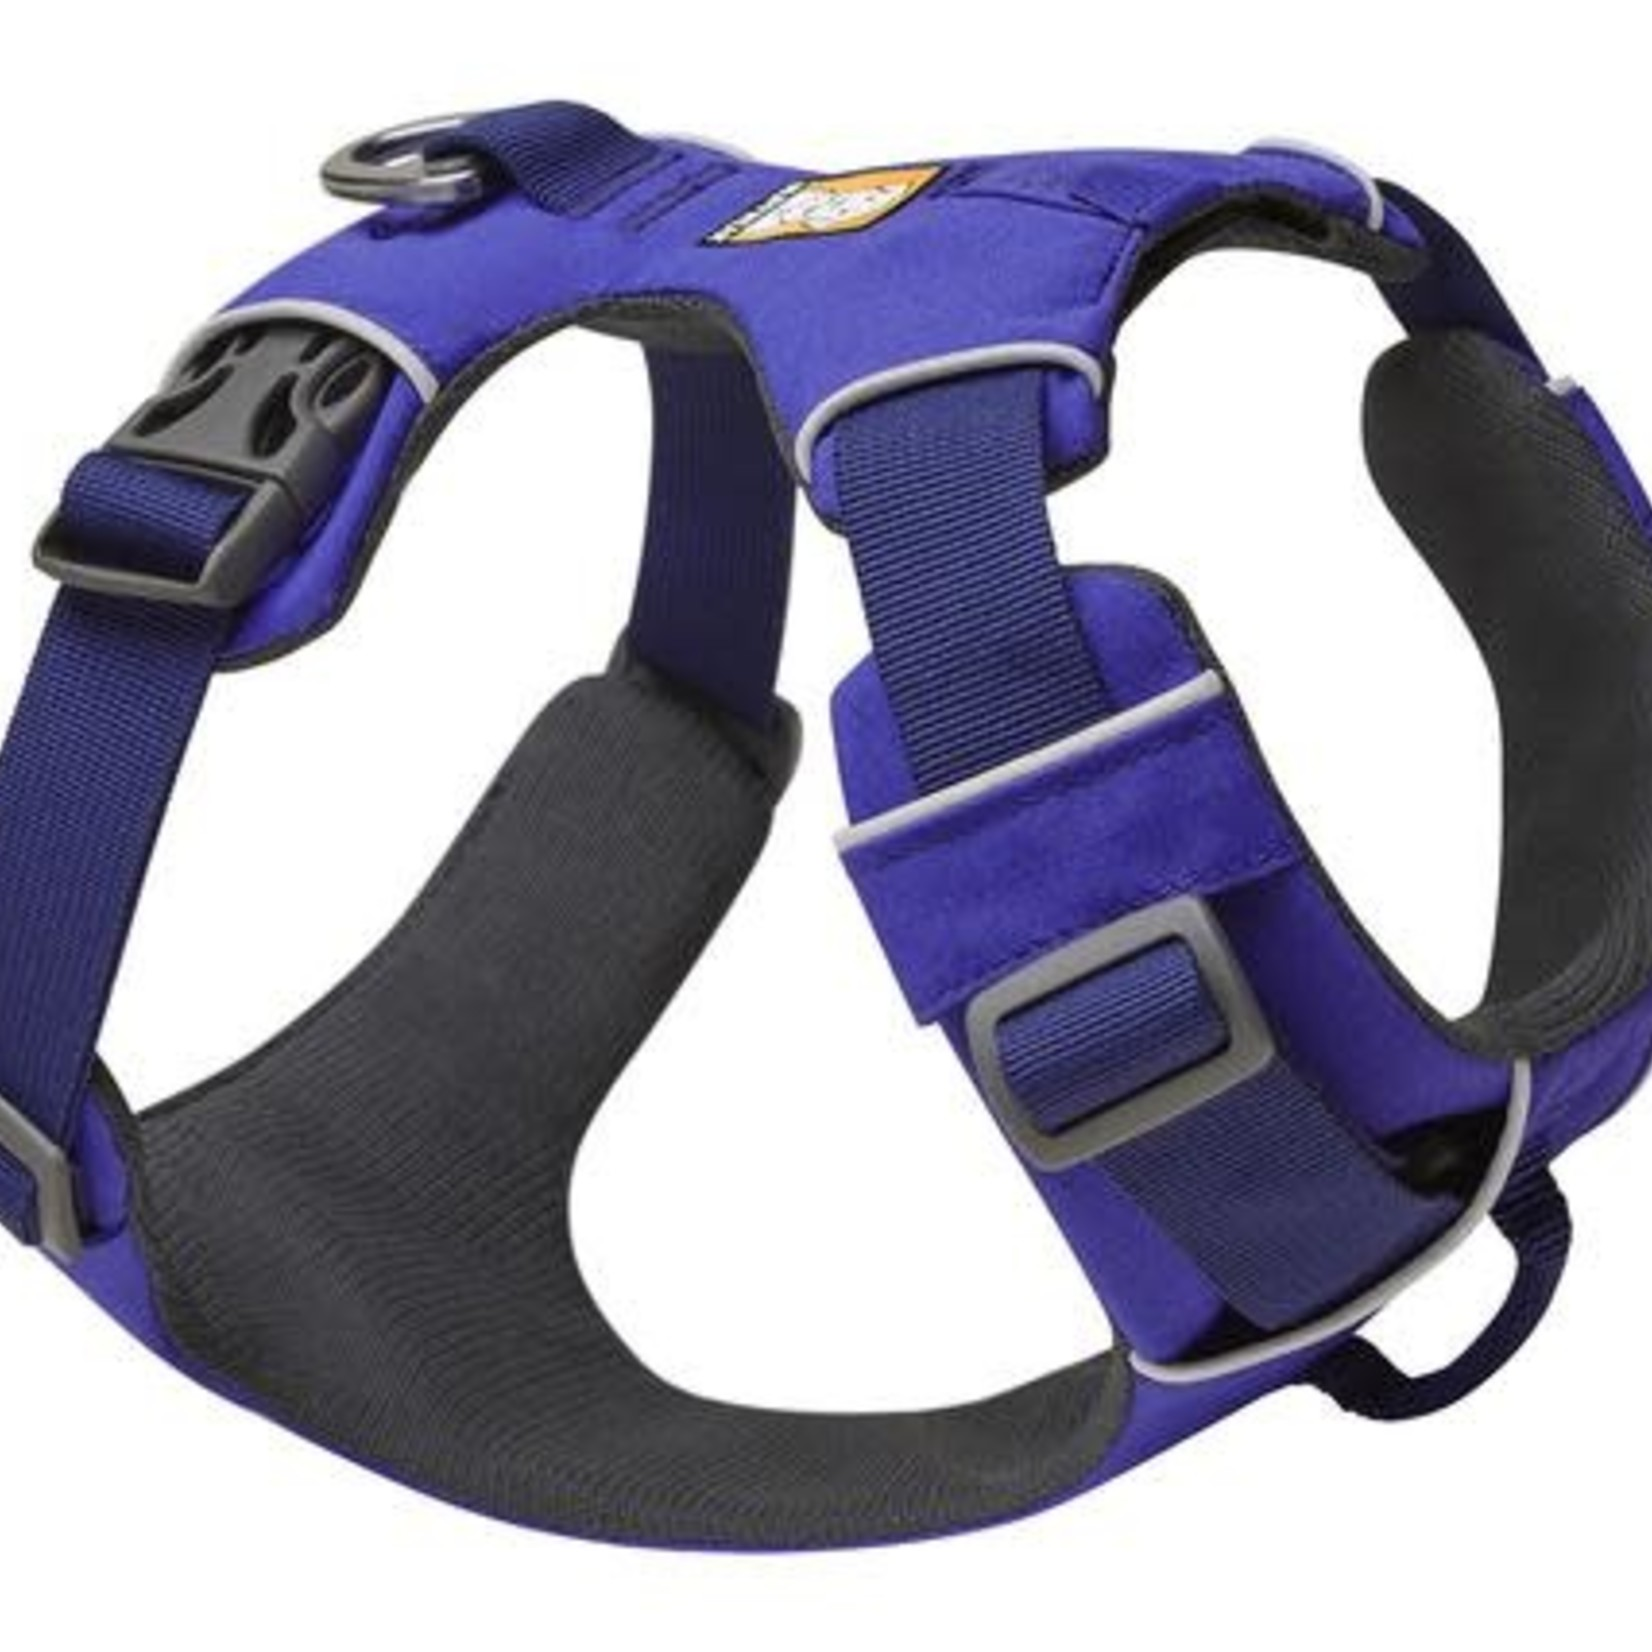 Ruff Wear Ruffwear Front Range Harness Huckleberry Blue Medium